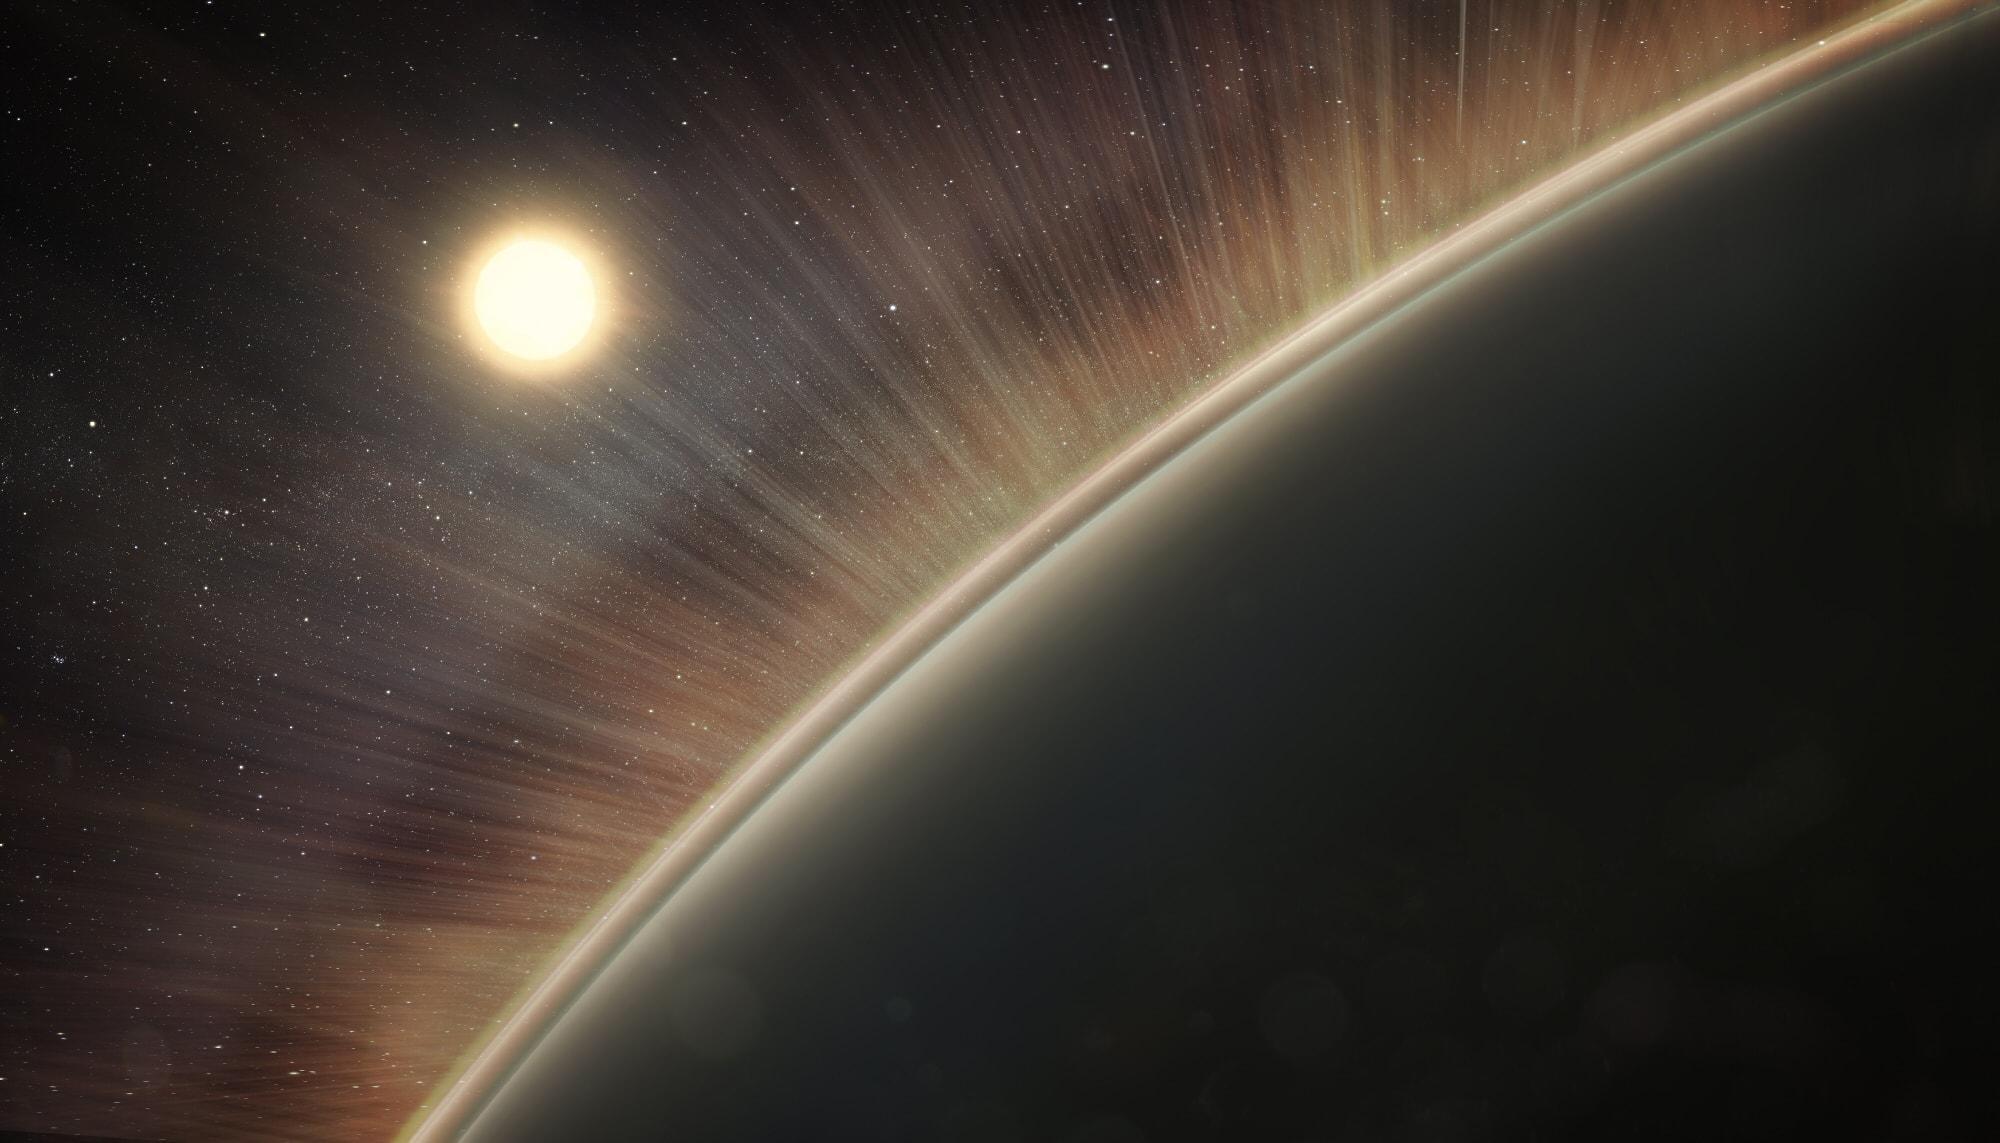 Venus Widescreen for desktop